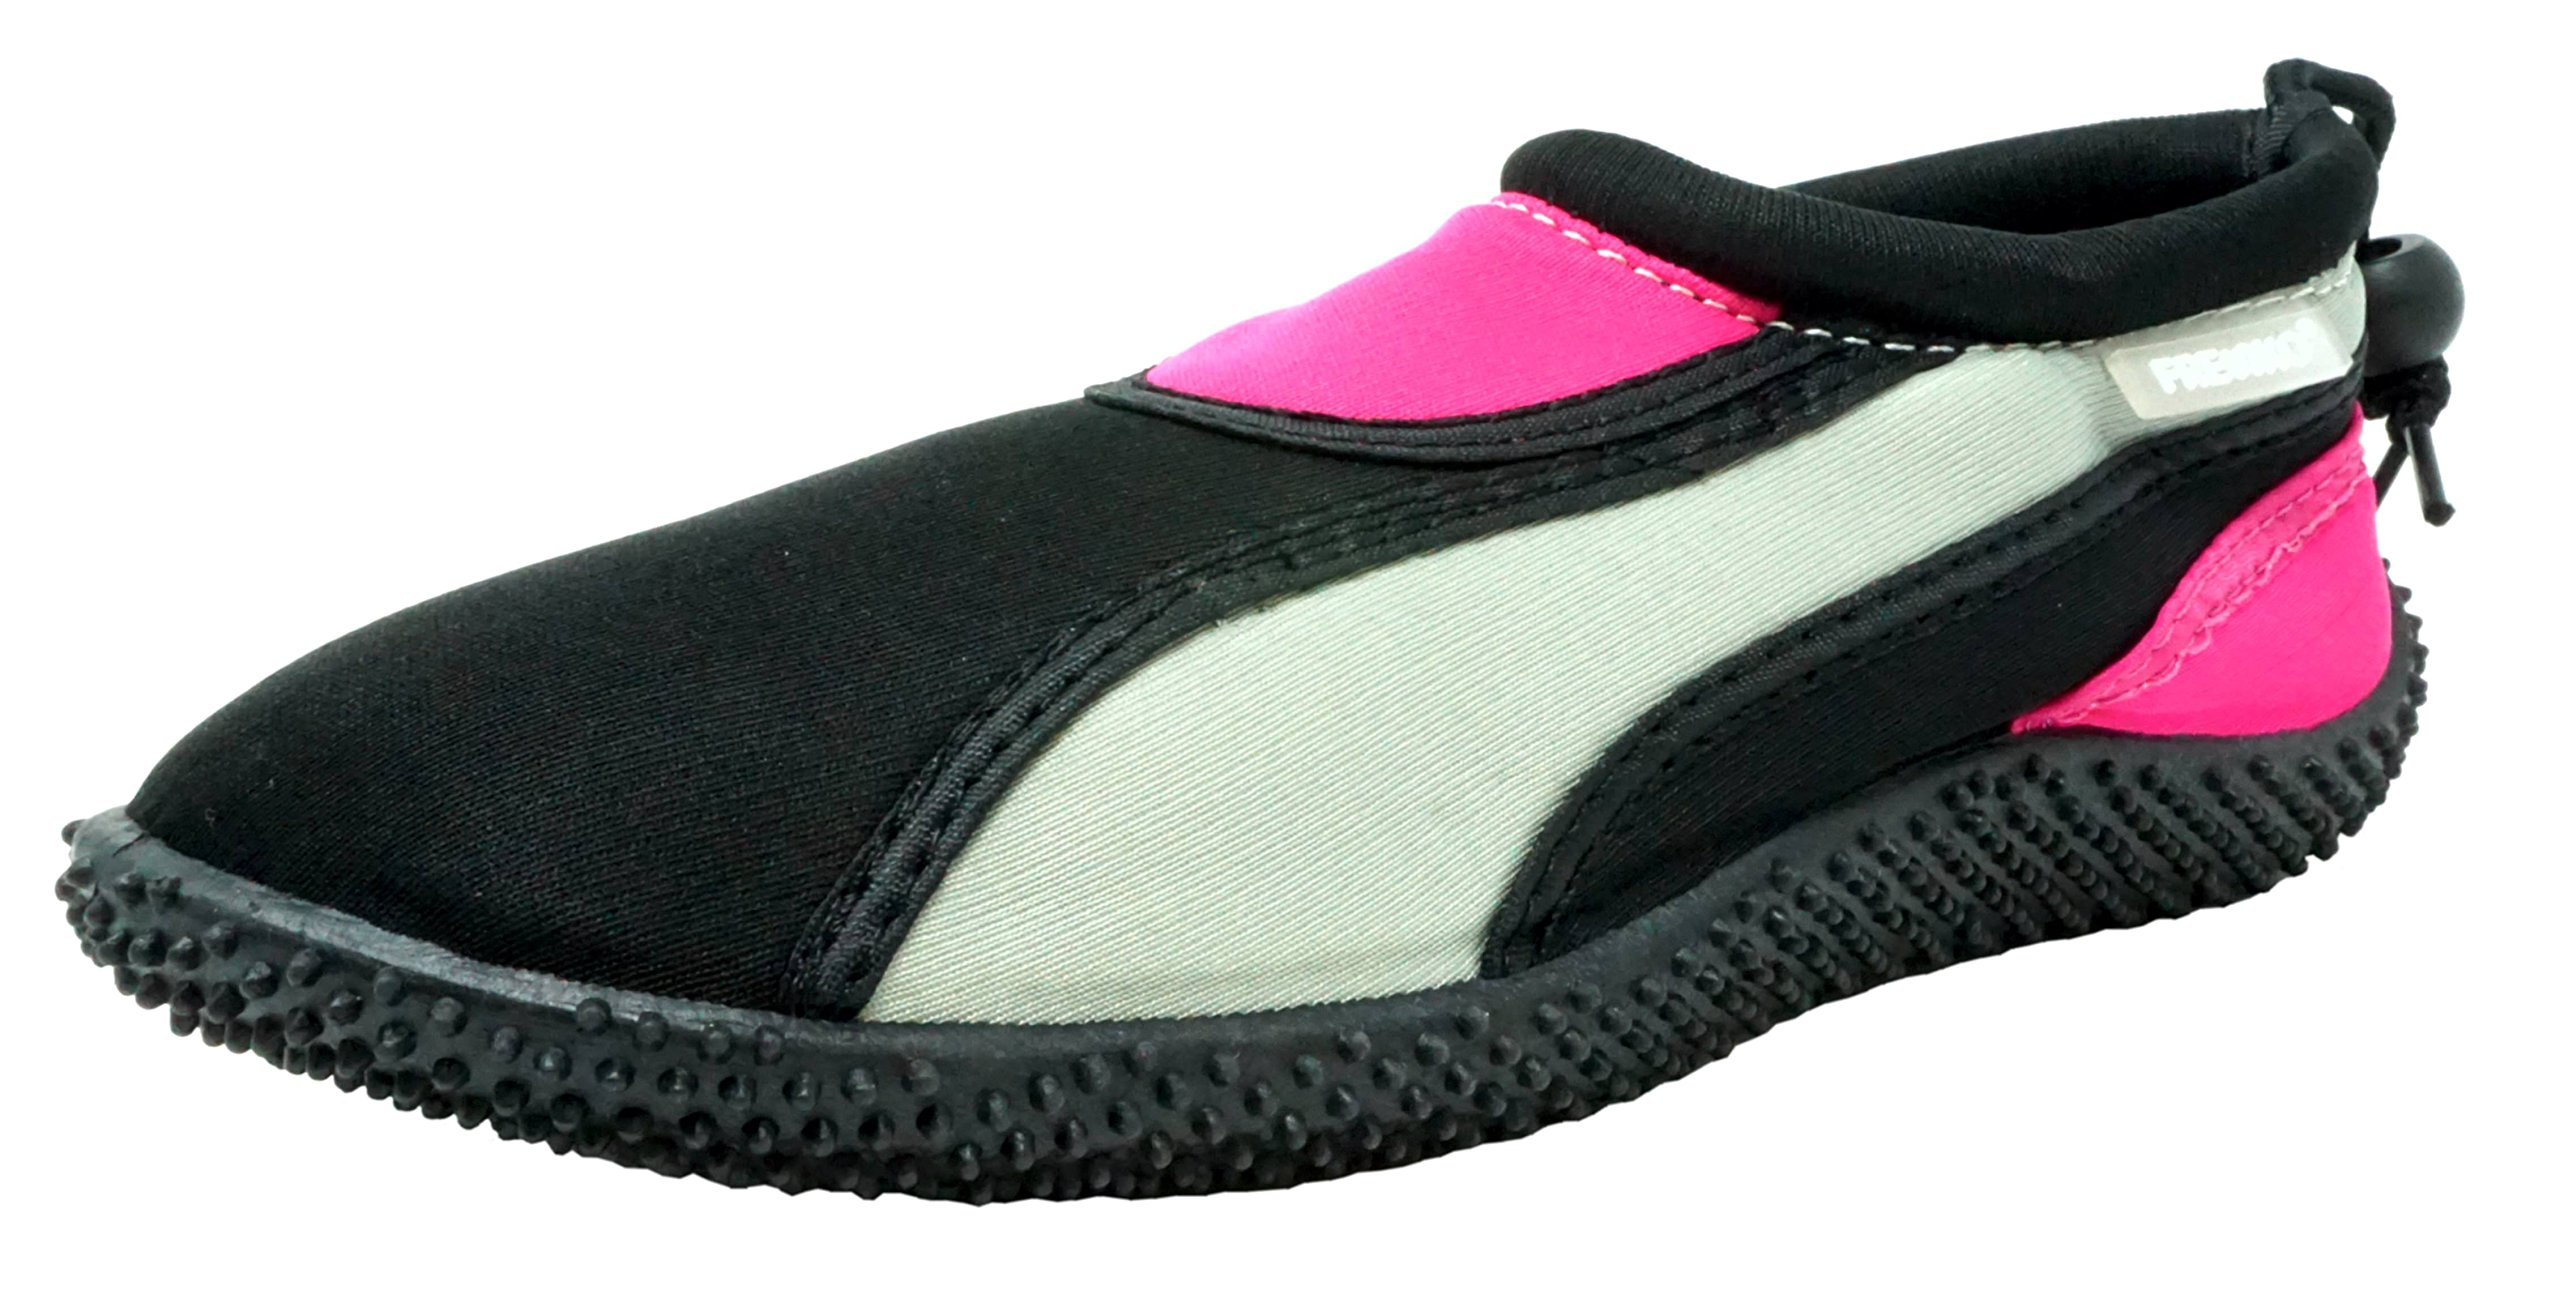 Fresko Women's Water Shoes, L2011, Fuchsia, 7 M US by Fresko